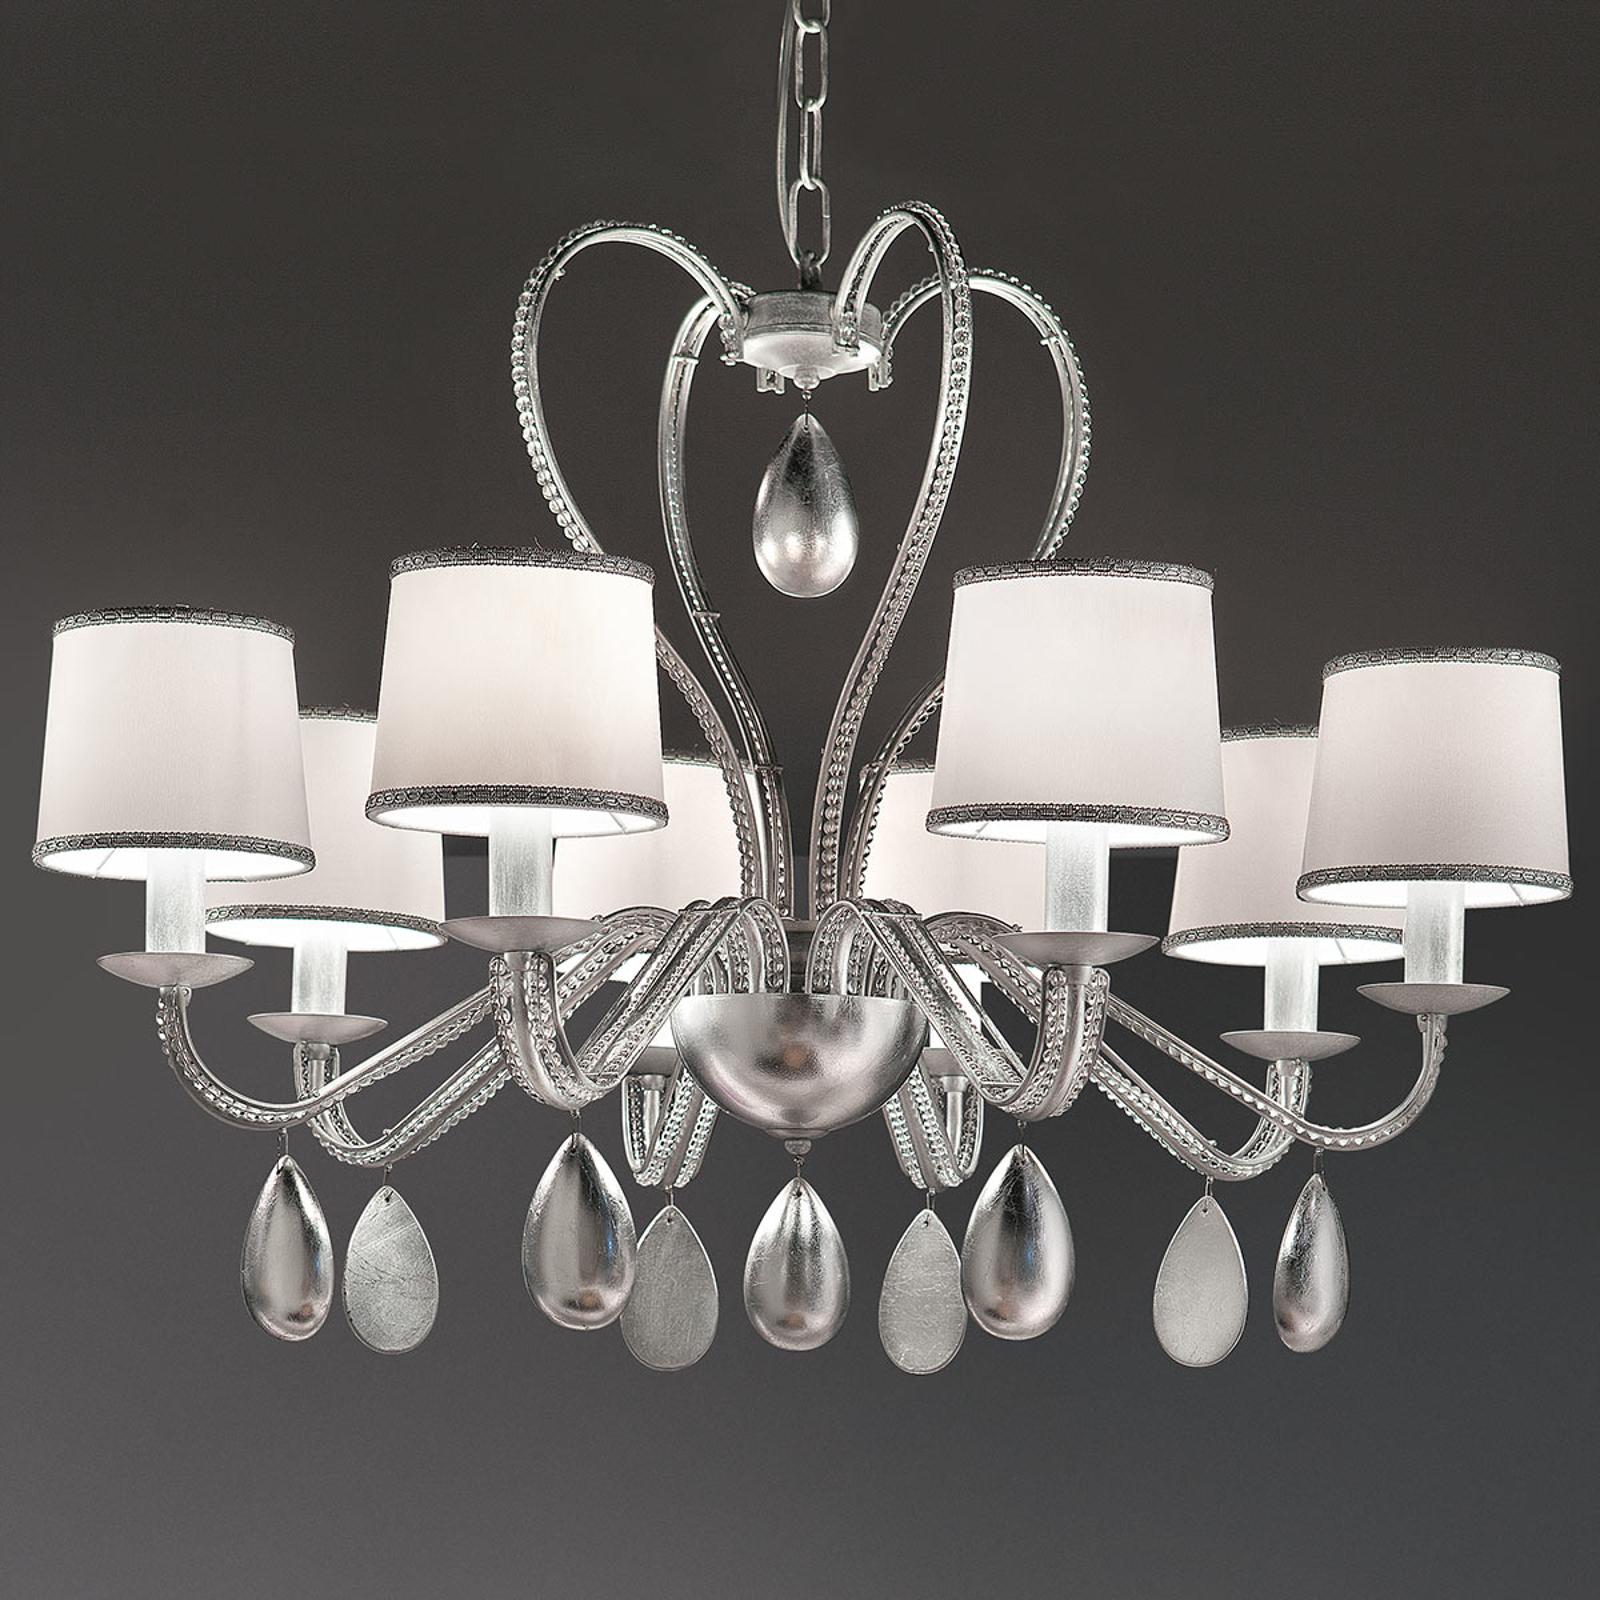 Żyrandol Anouk srebrny, 8-punktowy